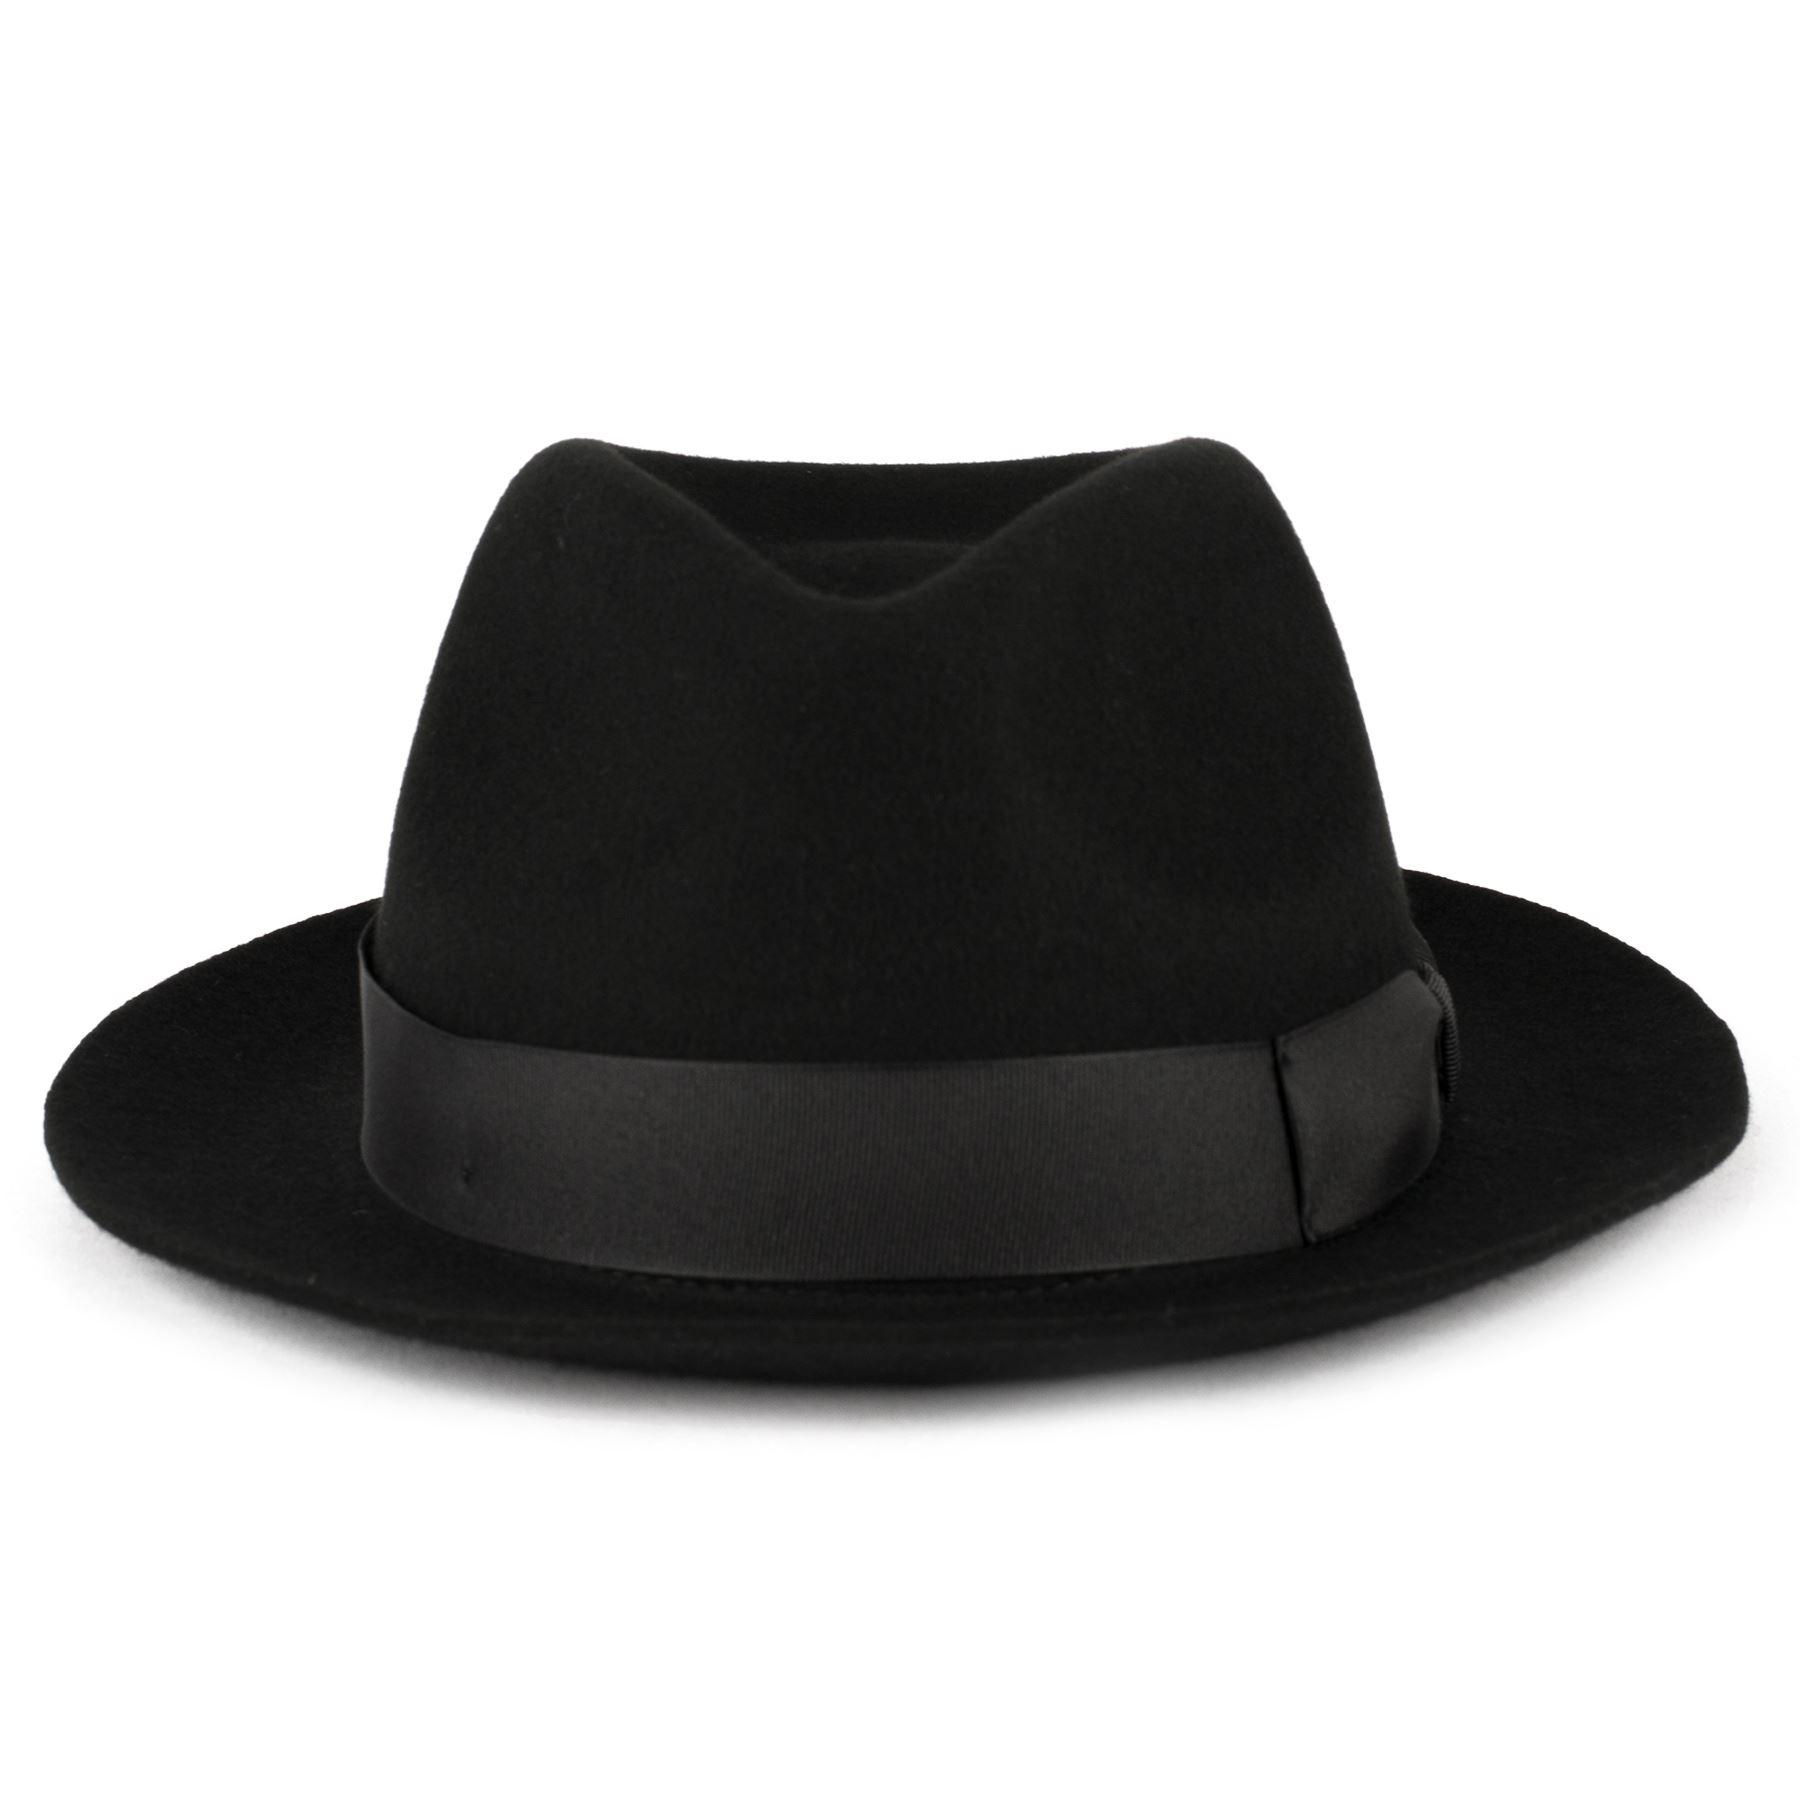 77190b3218a2c ZAKIRA Medium Brim Fedora Hat in Finest Crushable Wool Felt ...